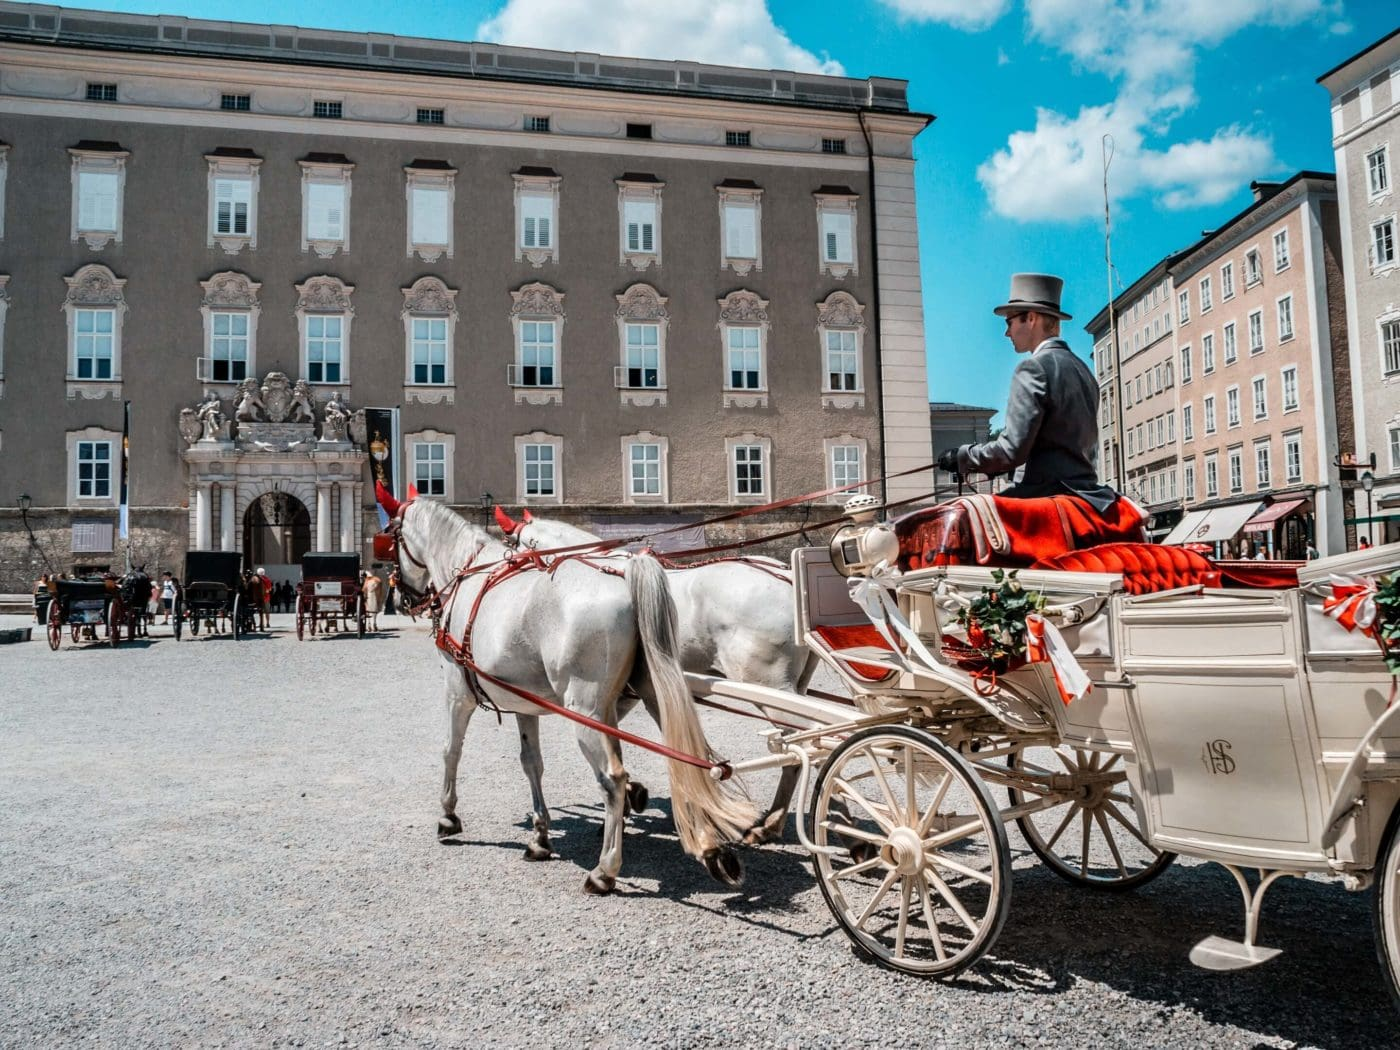 Postcard from Austria: Carriage Ride iN Salzburg